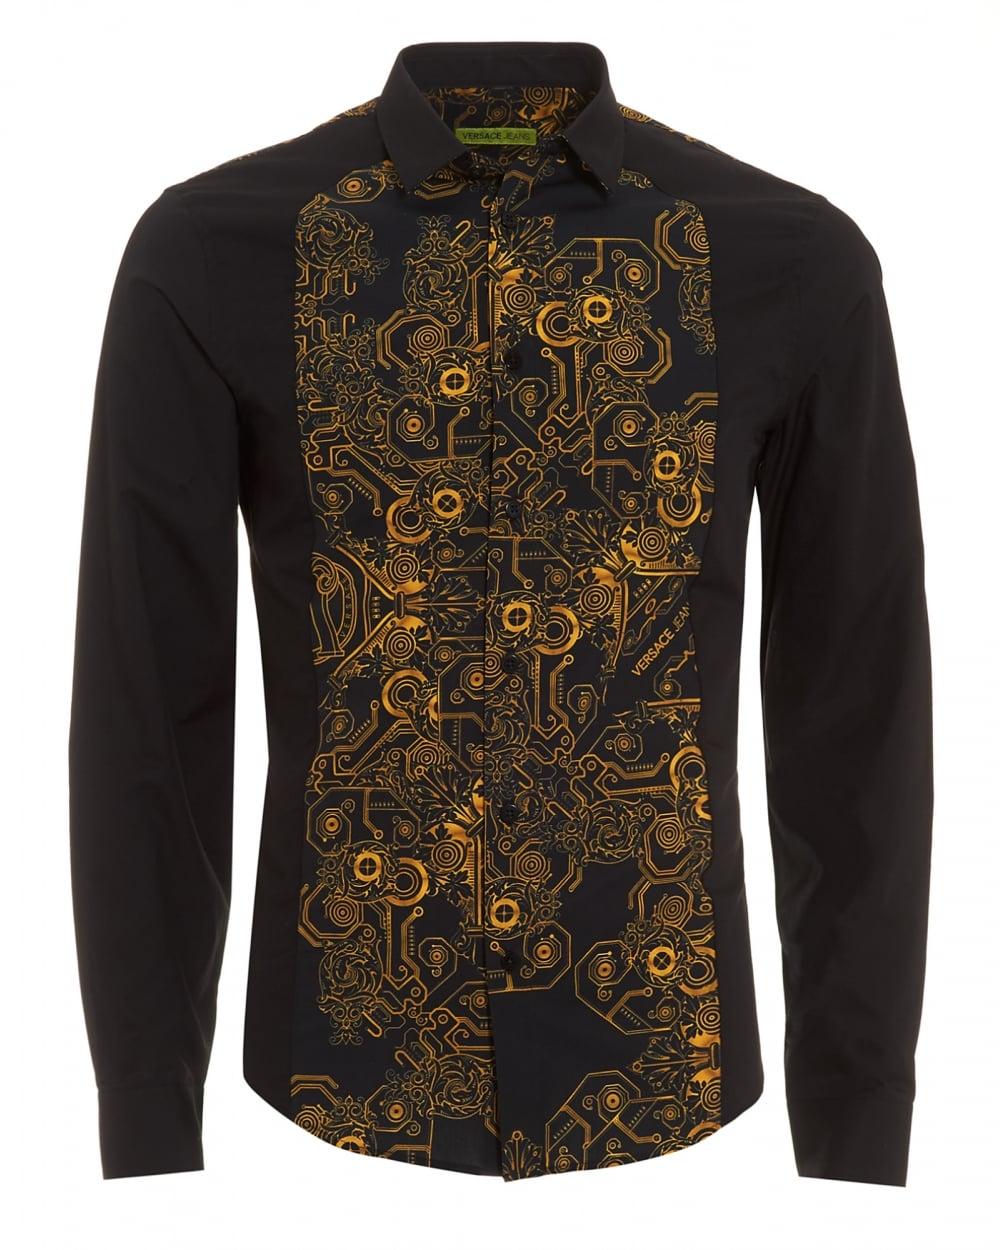 Versace jeans mens black shirt gold digital baroque for Versace style shirt mens